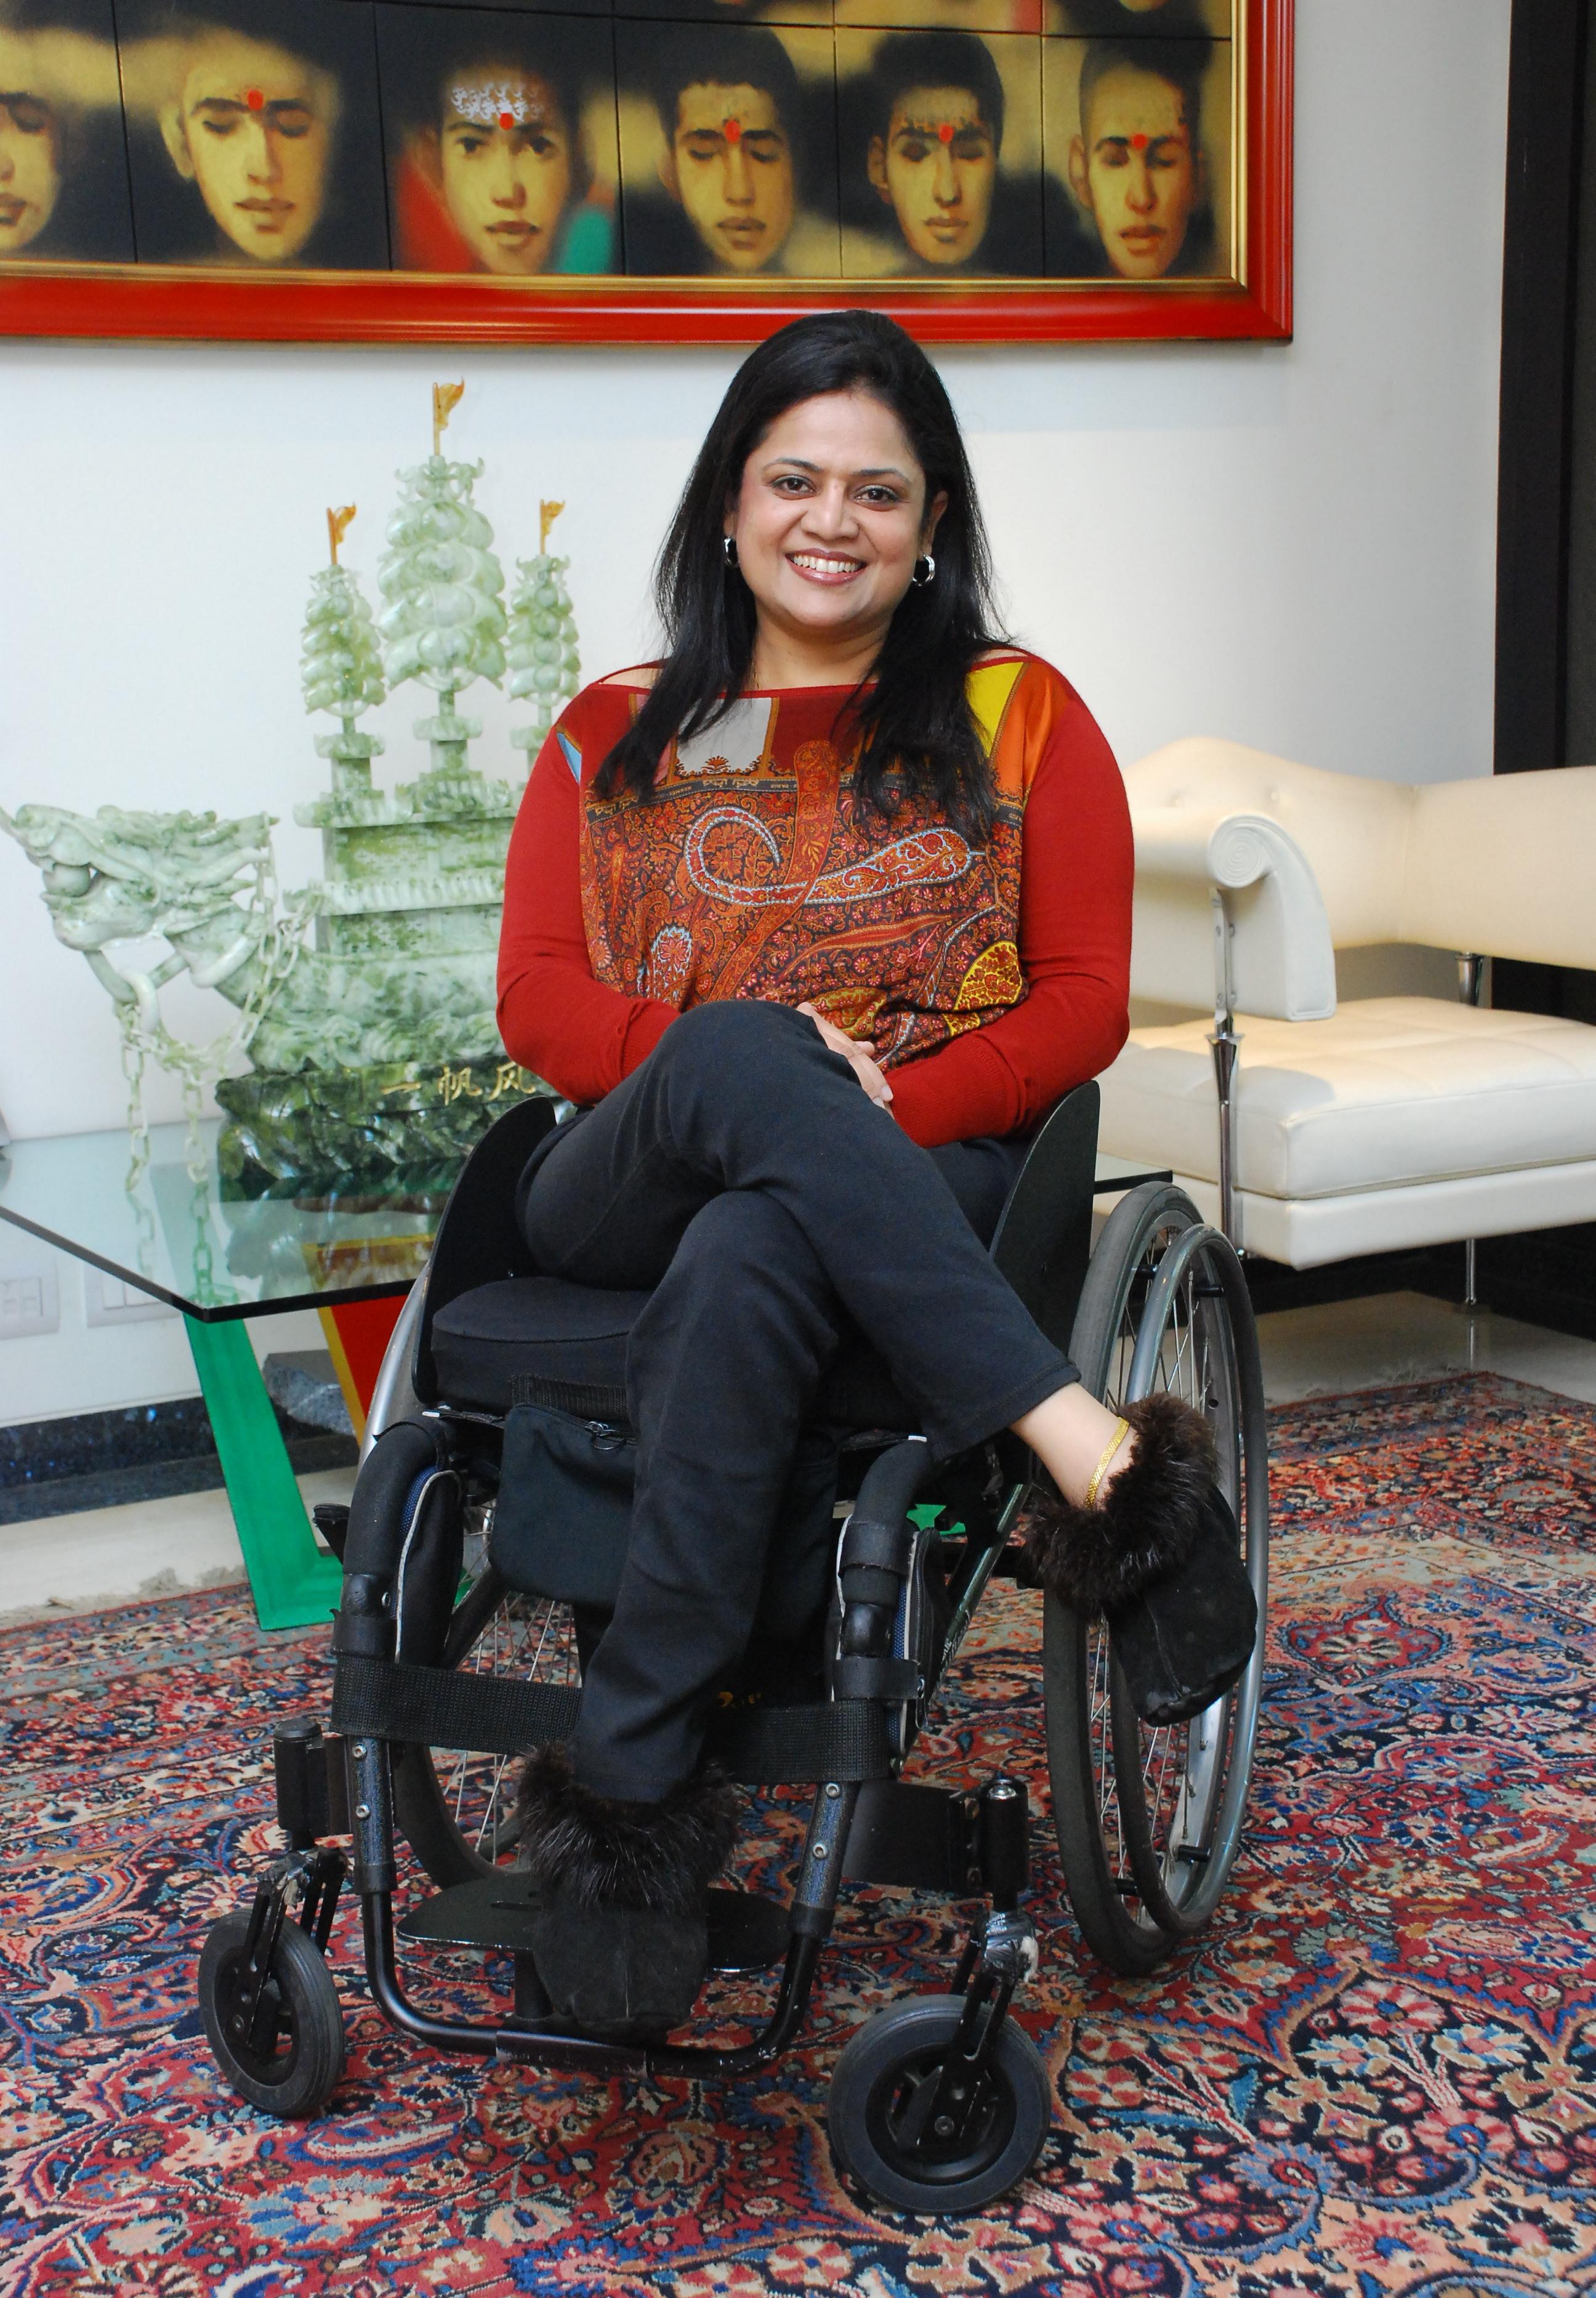 Photo of Ms. Sminu Jindal, Founder Svayam